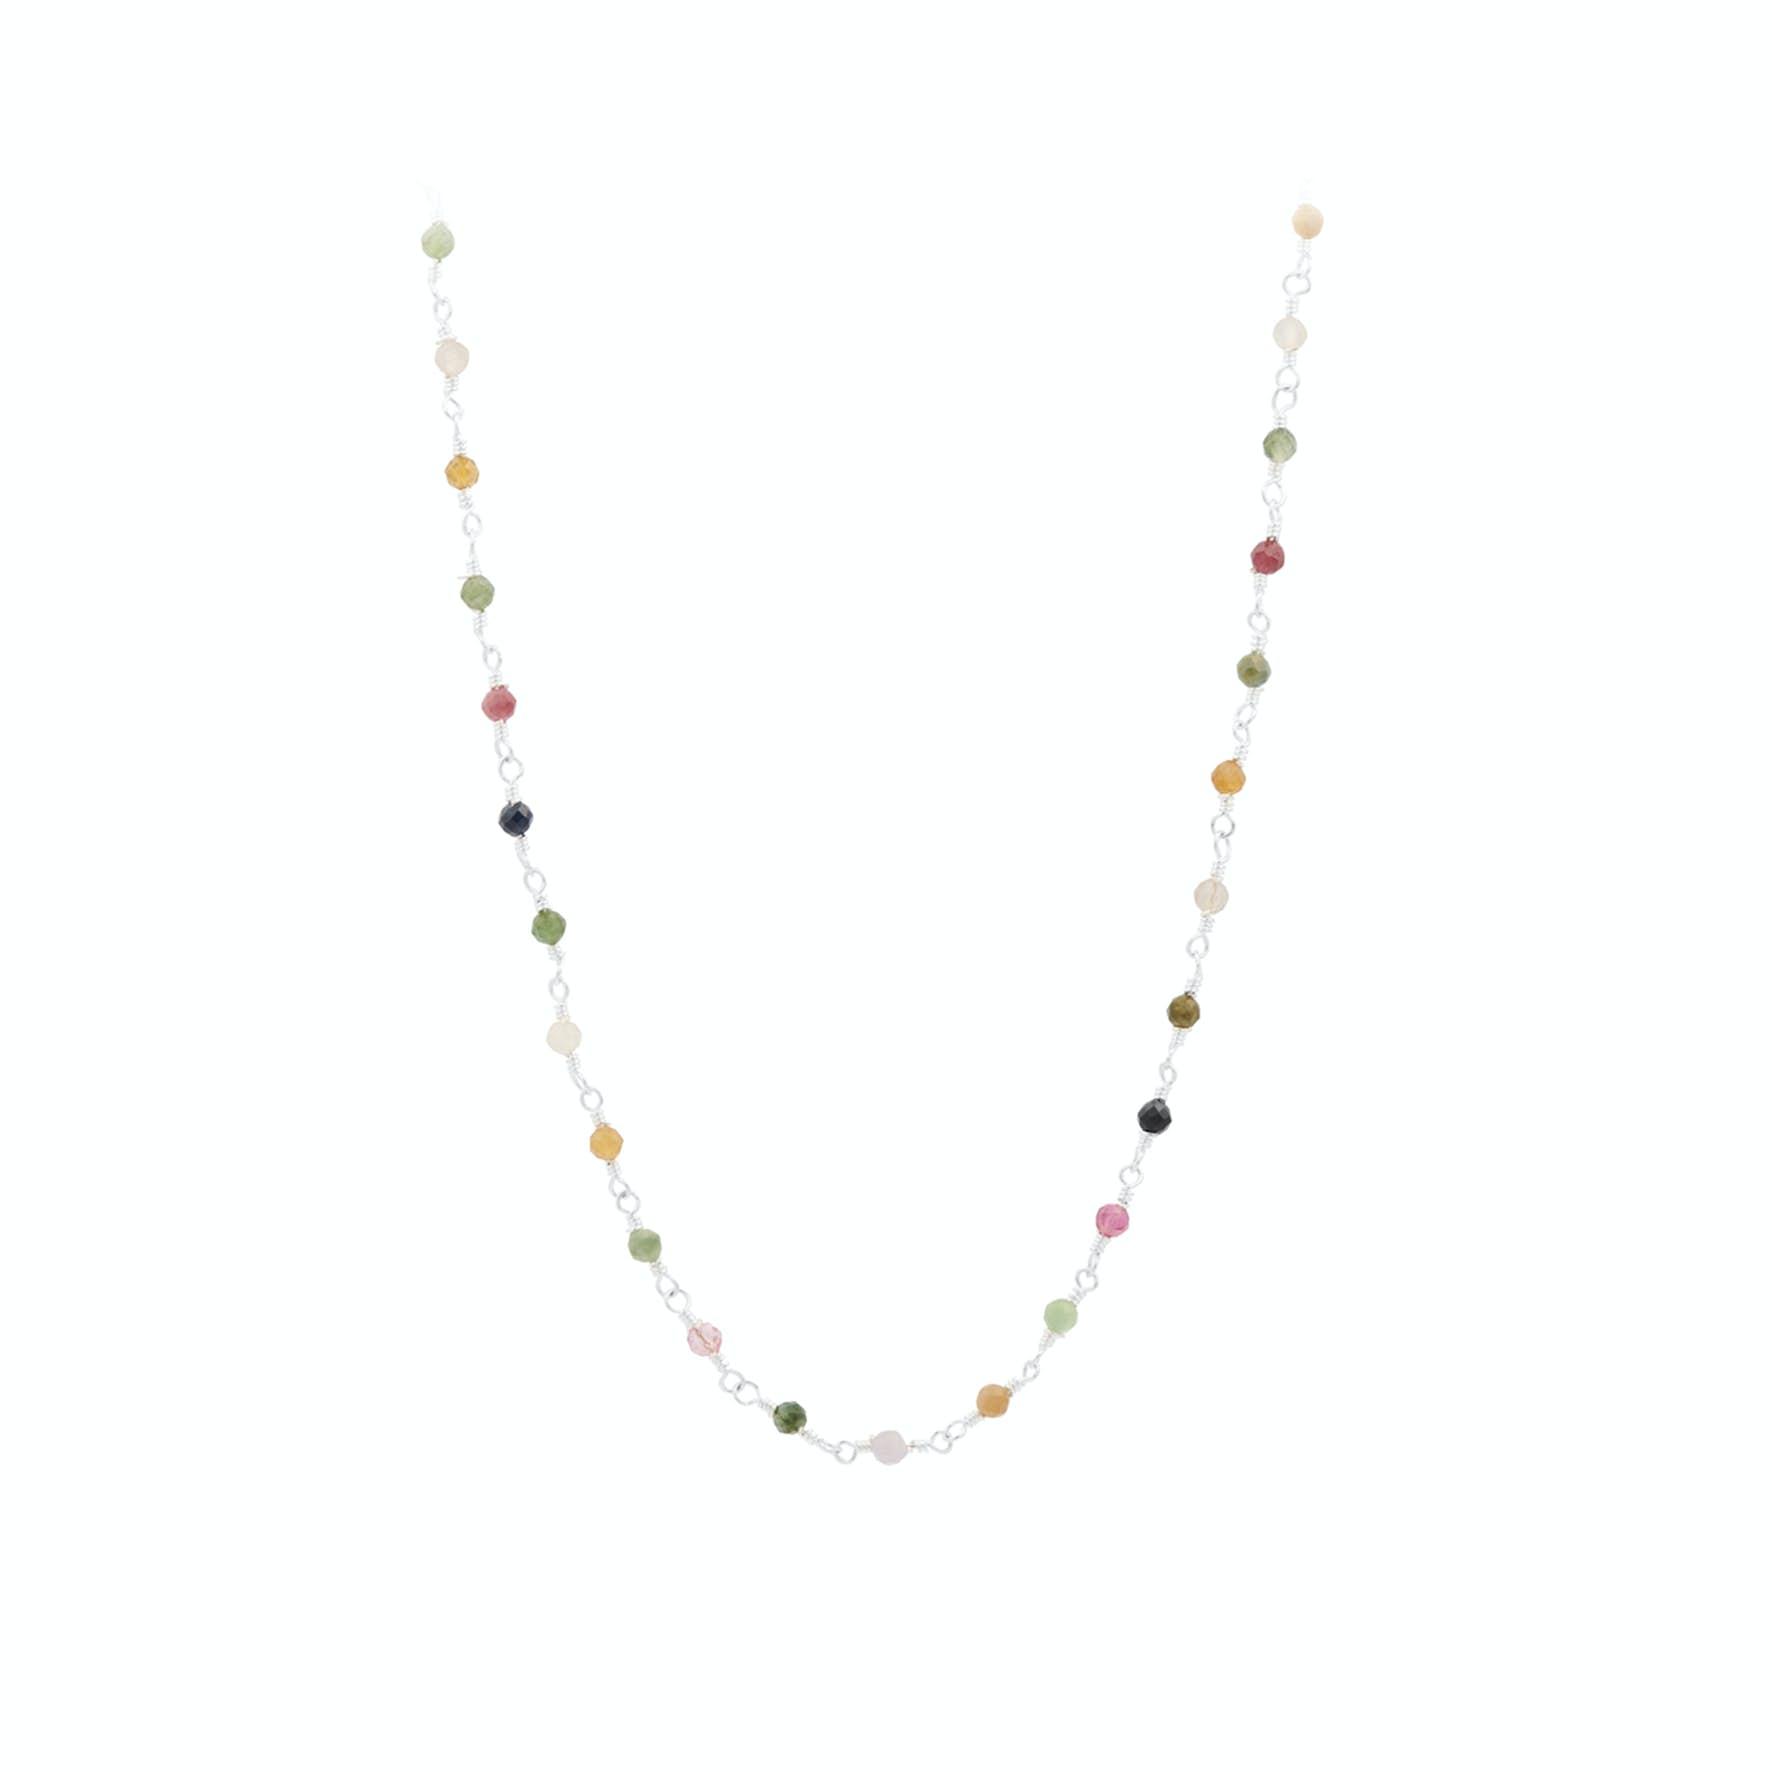 Shade Necklace von Pernille Corydon in Silber Sterling 925|Turmalin